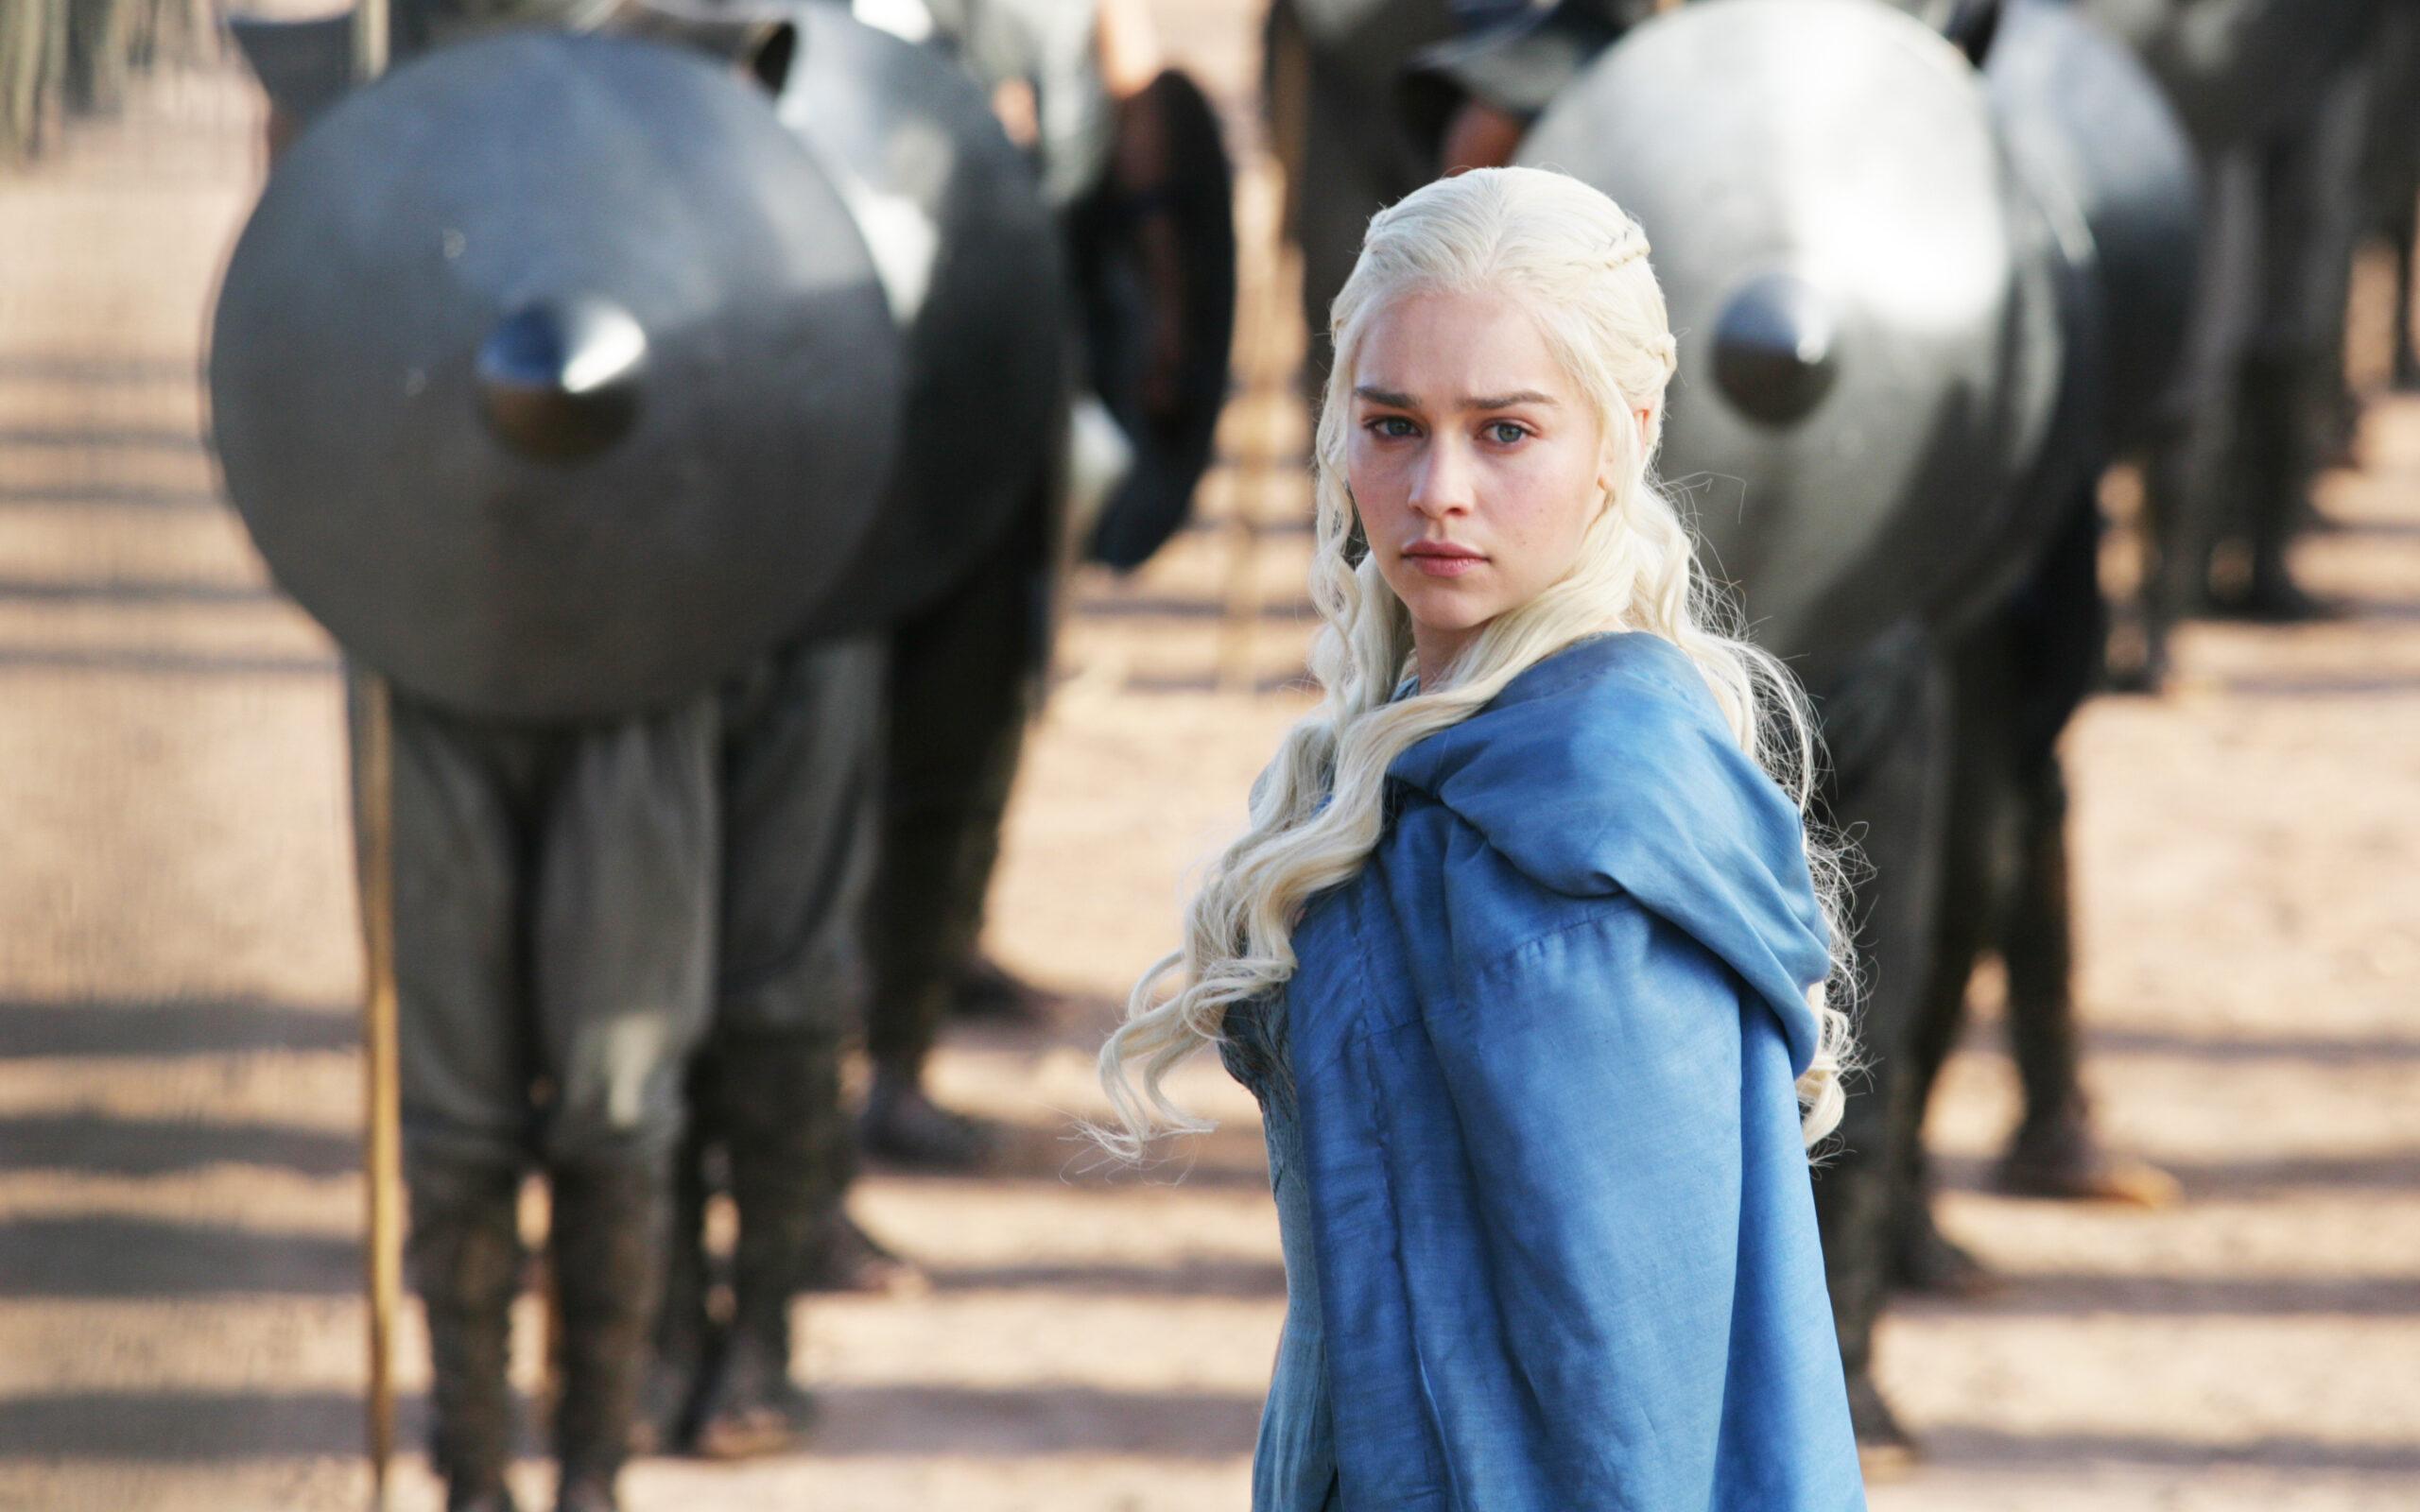 Emilia Clarke Says Male Game Of Thrones Stars Got Preferential Treatment